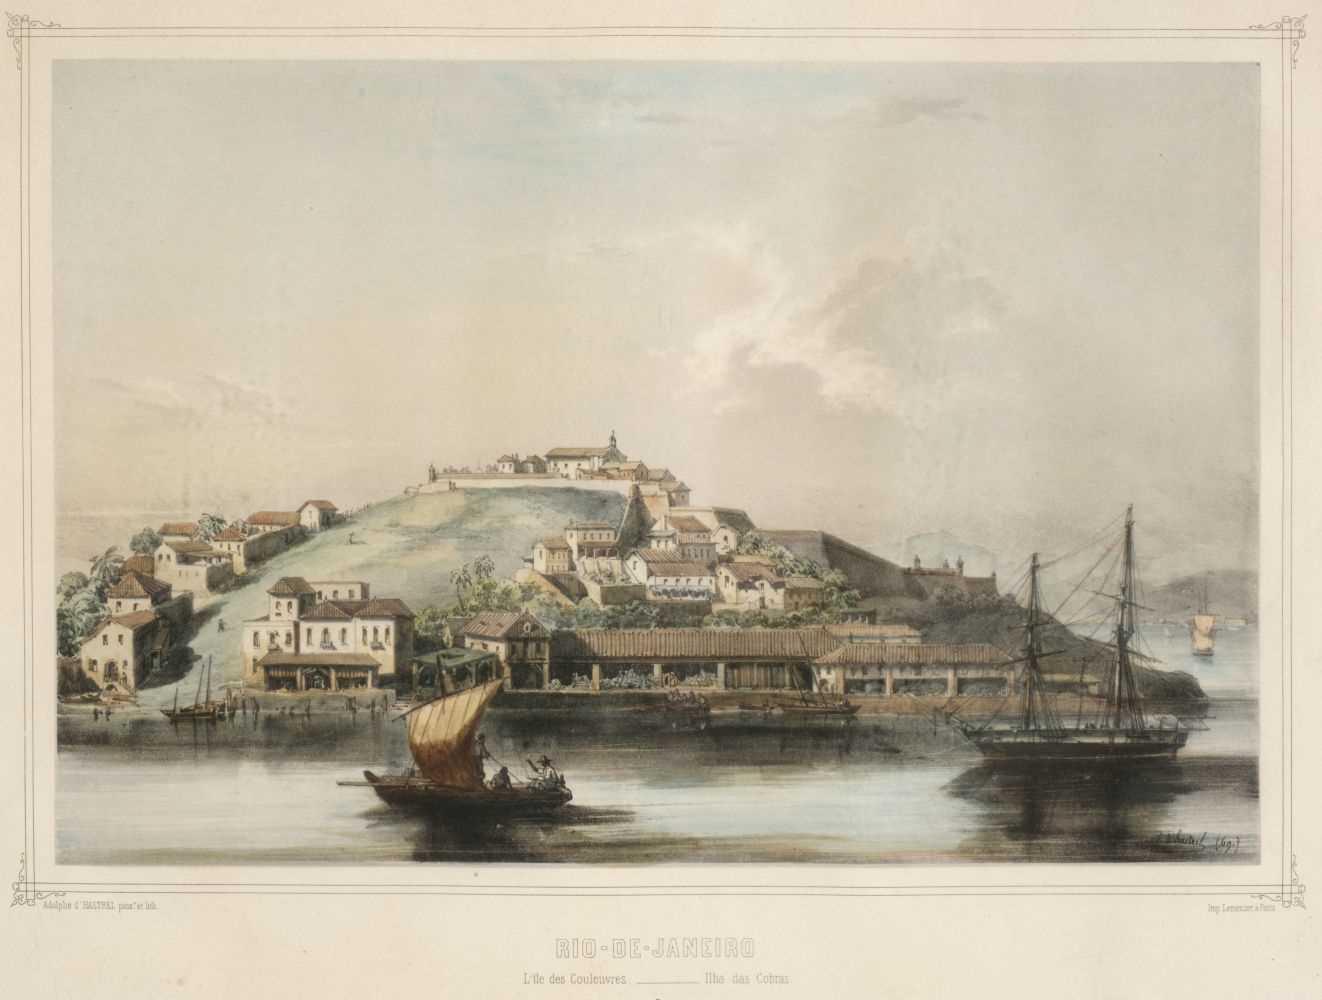 Lot 15 - Hastrel (Adolphe d', 1805-1875). Rio de Janeiro, 3 colour lithographs